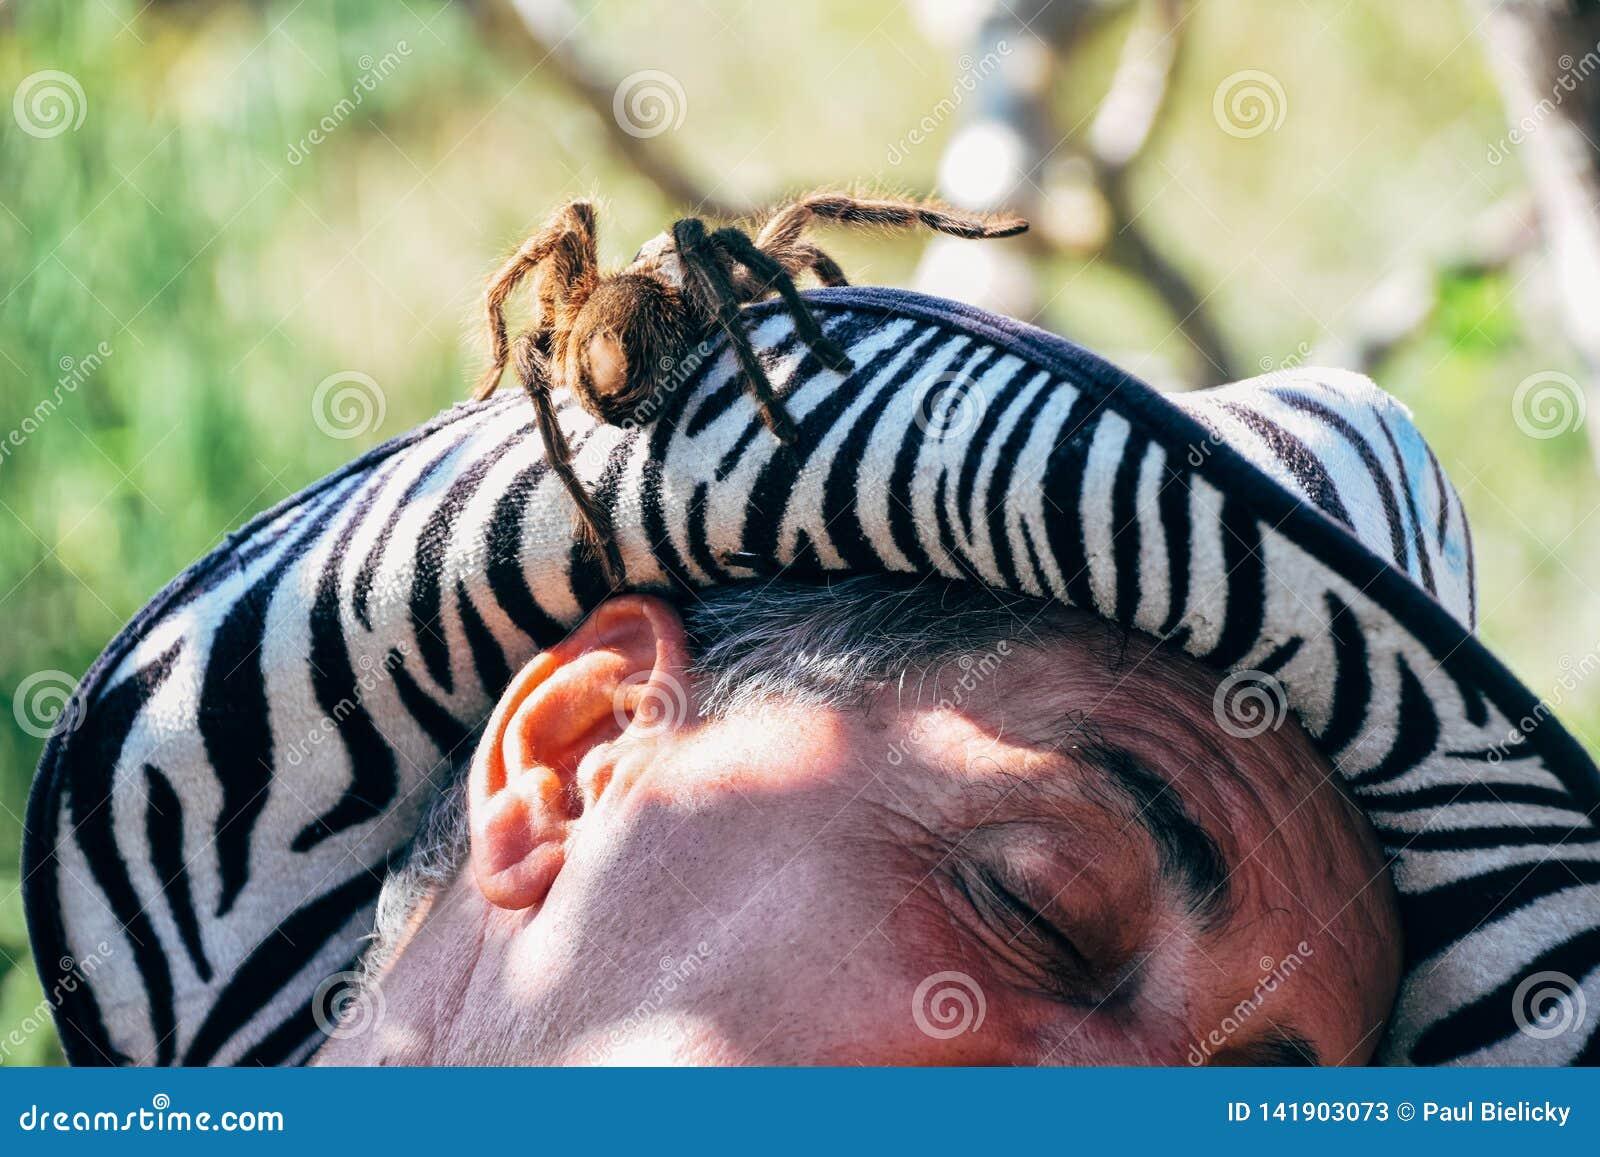 A local with his pet tarantula posses for the camera near Trinidad, Cuba.